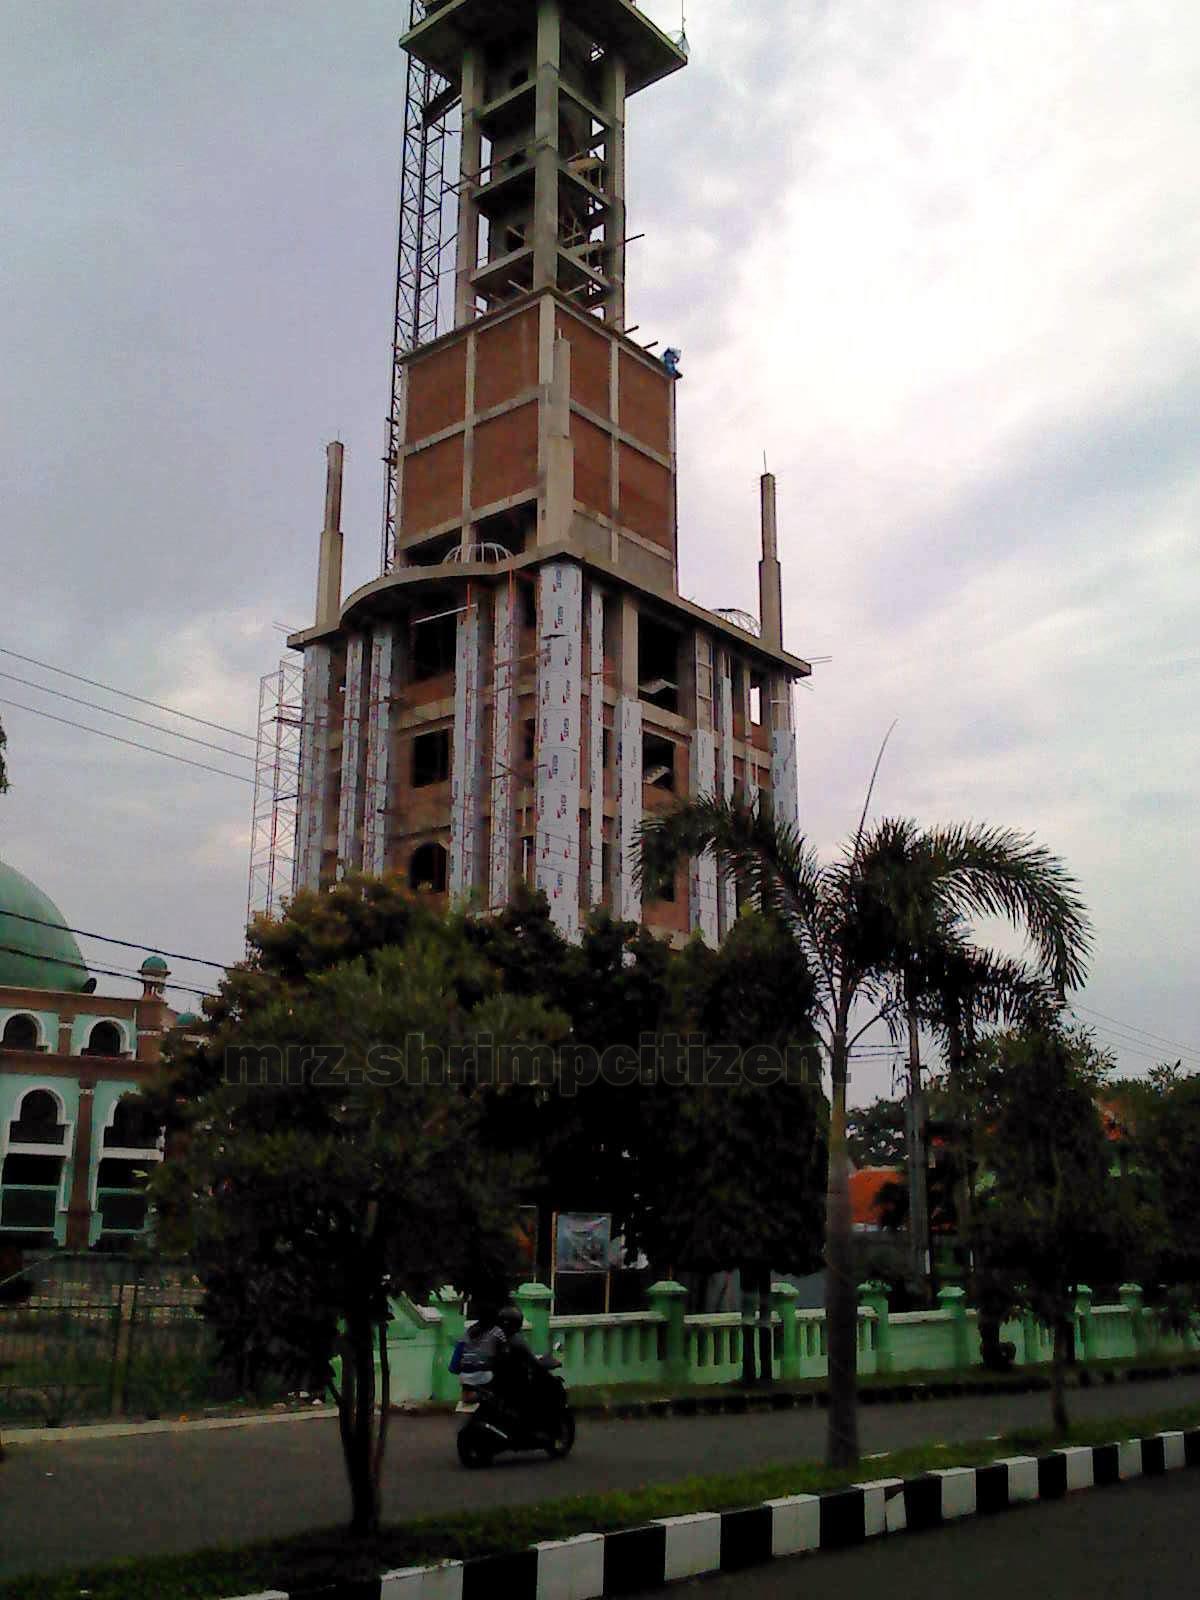 Pembangunan Menara Masjid Agung Sumber, Kab. Cirebon 6